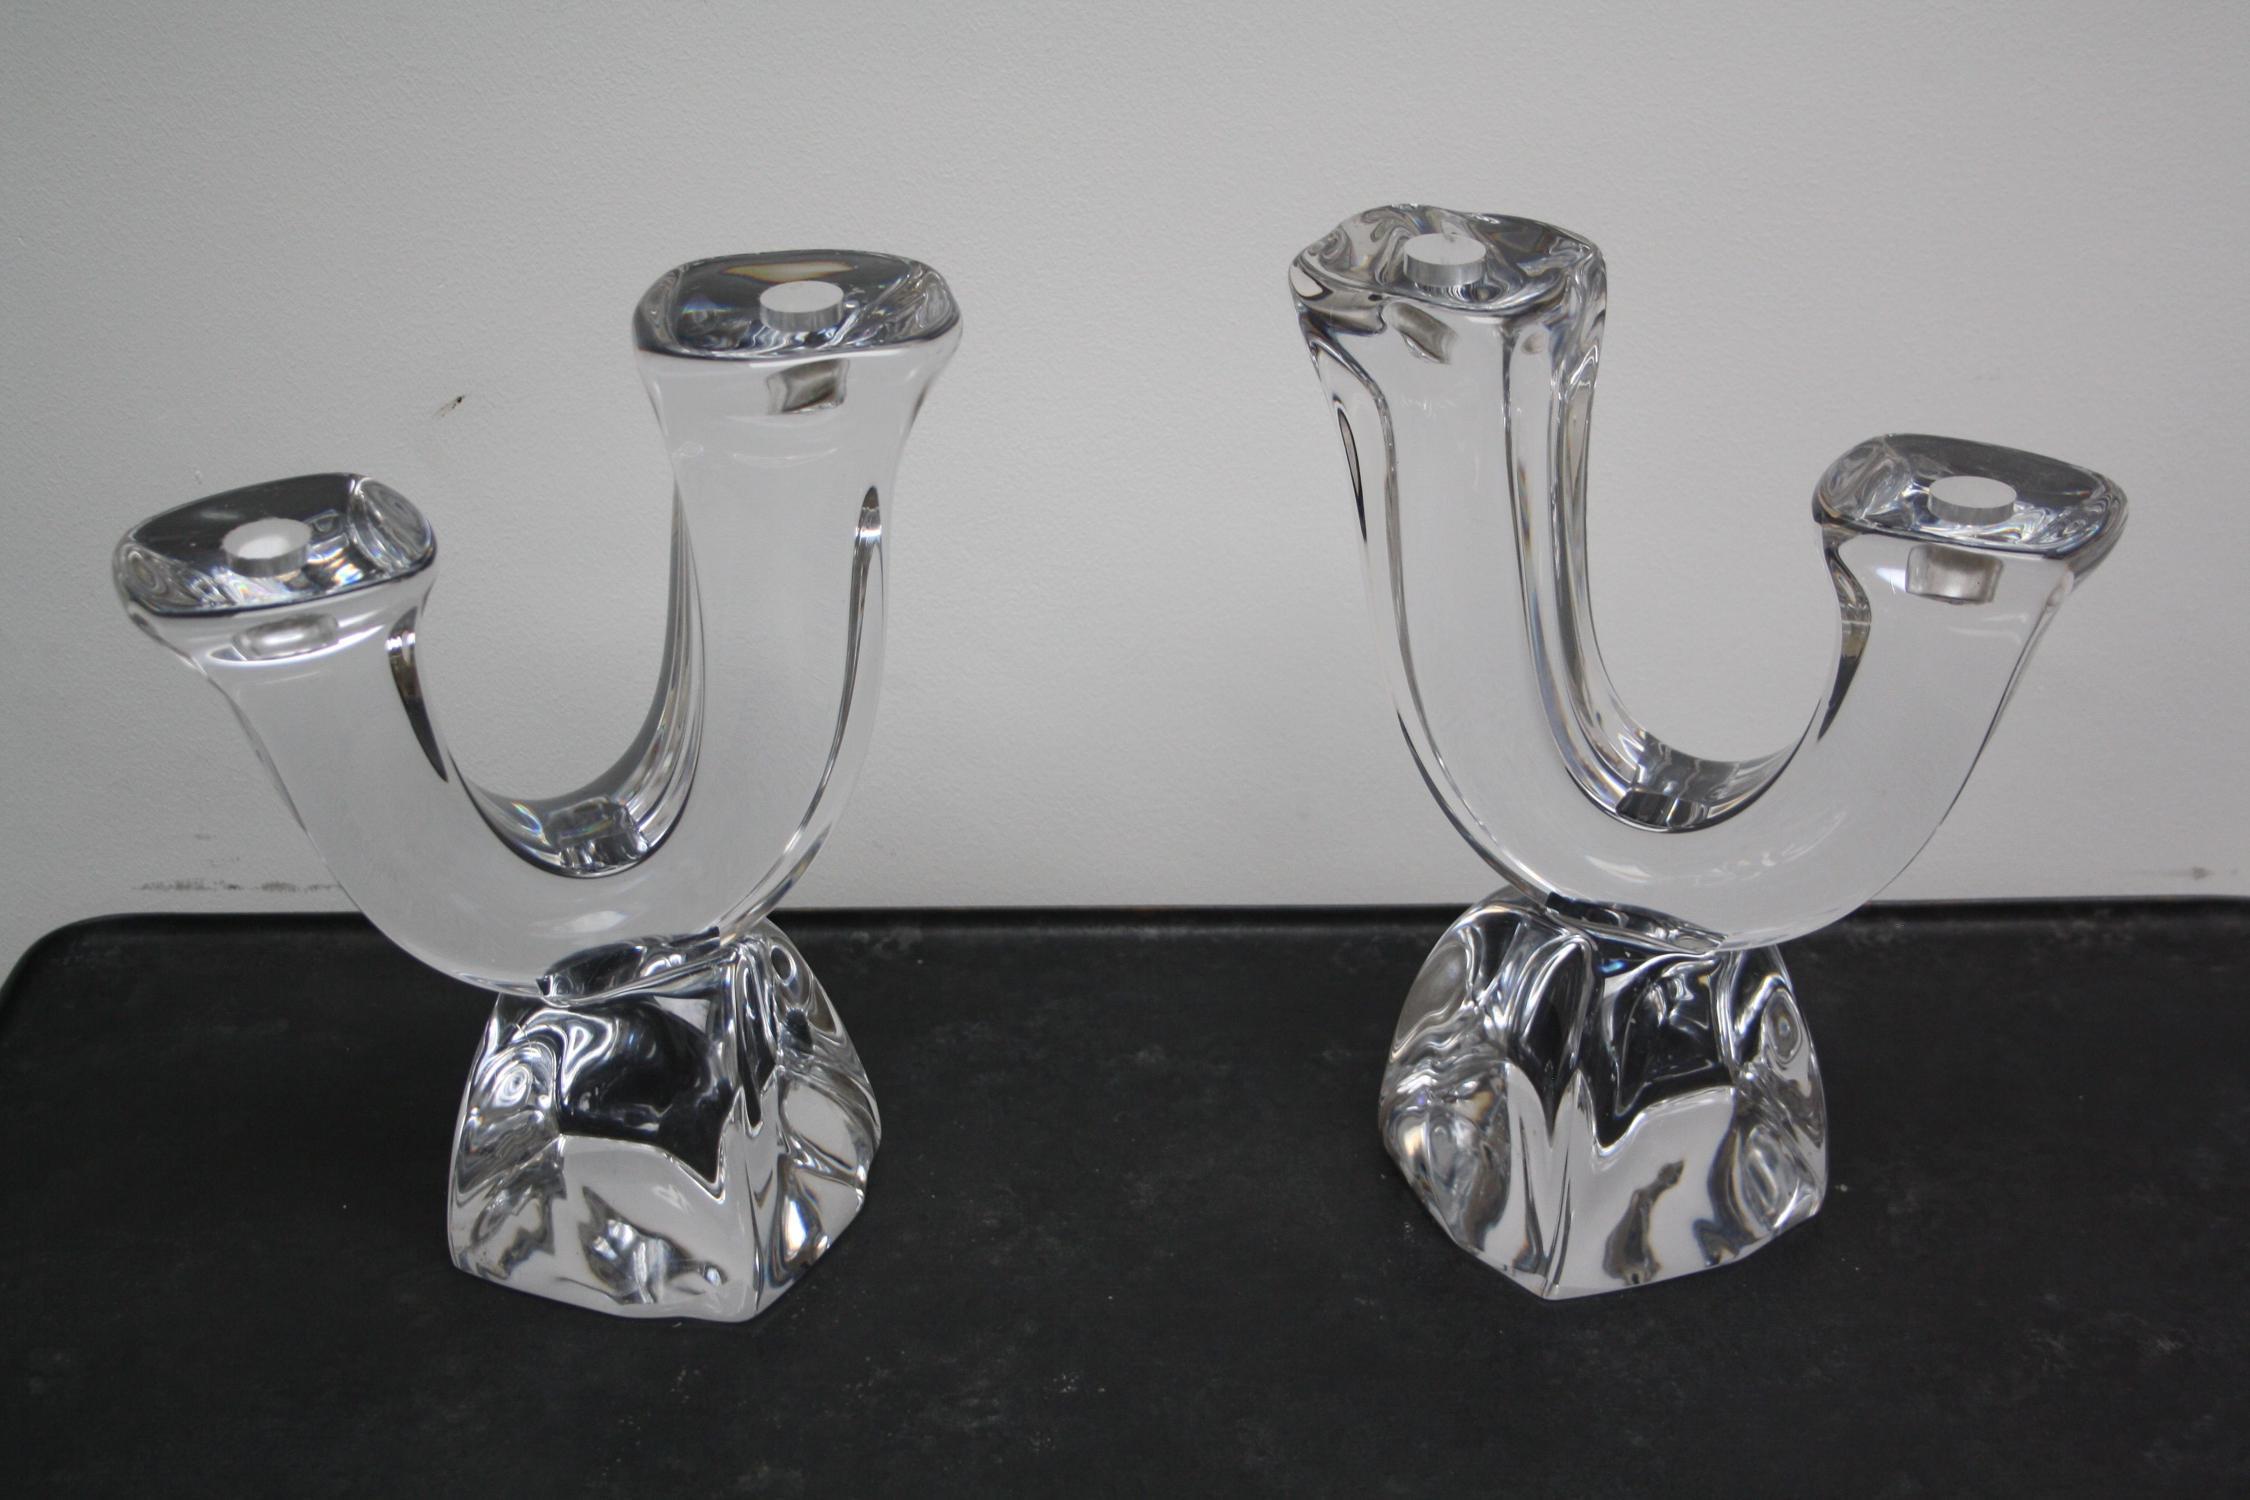 Daum glass candlesticks